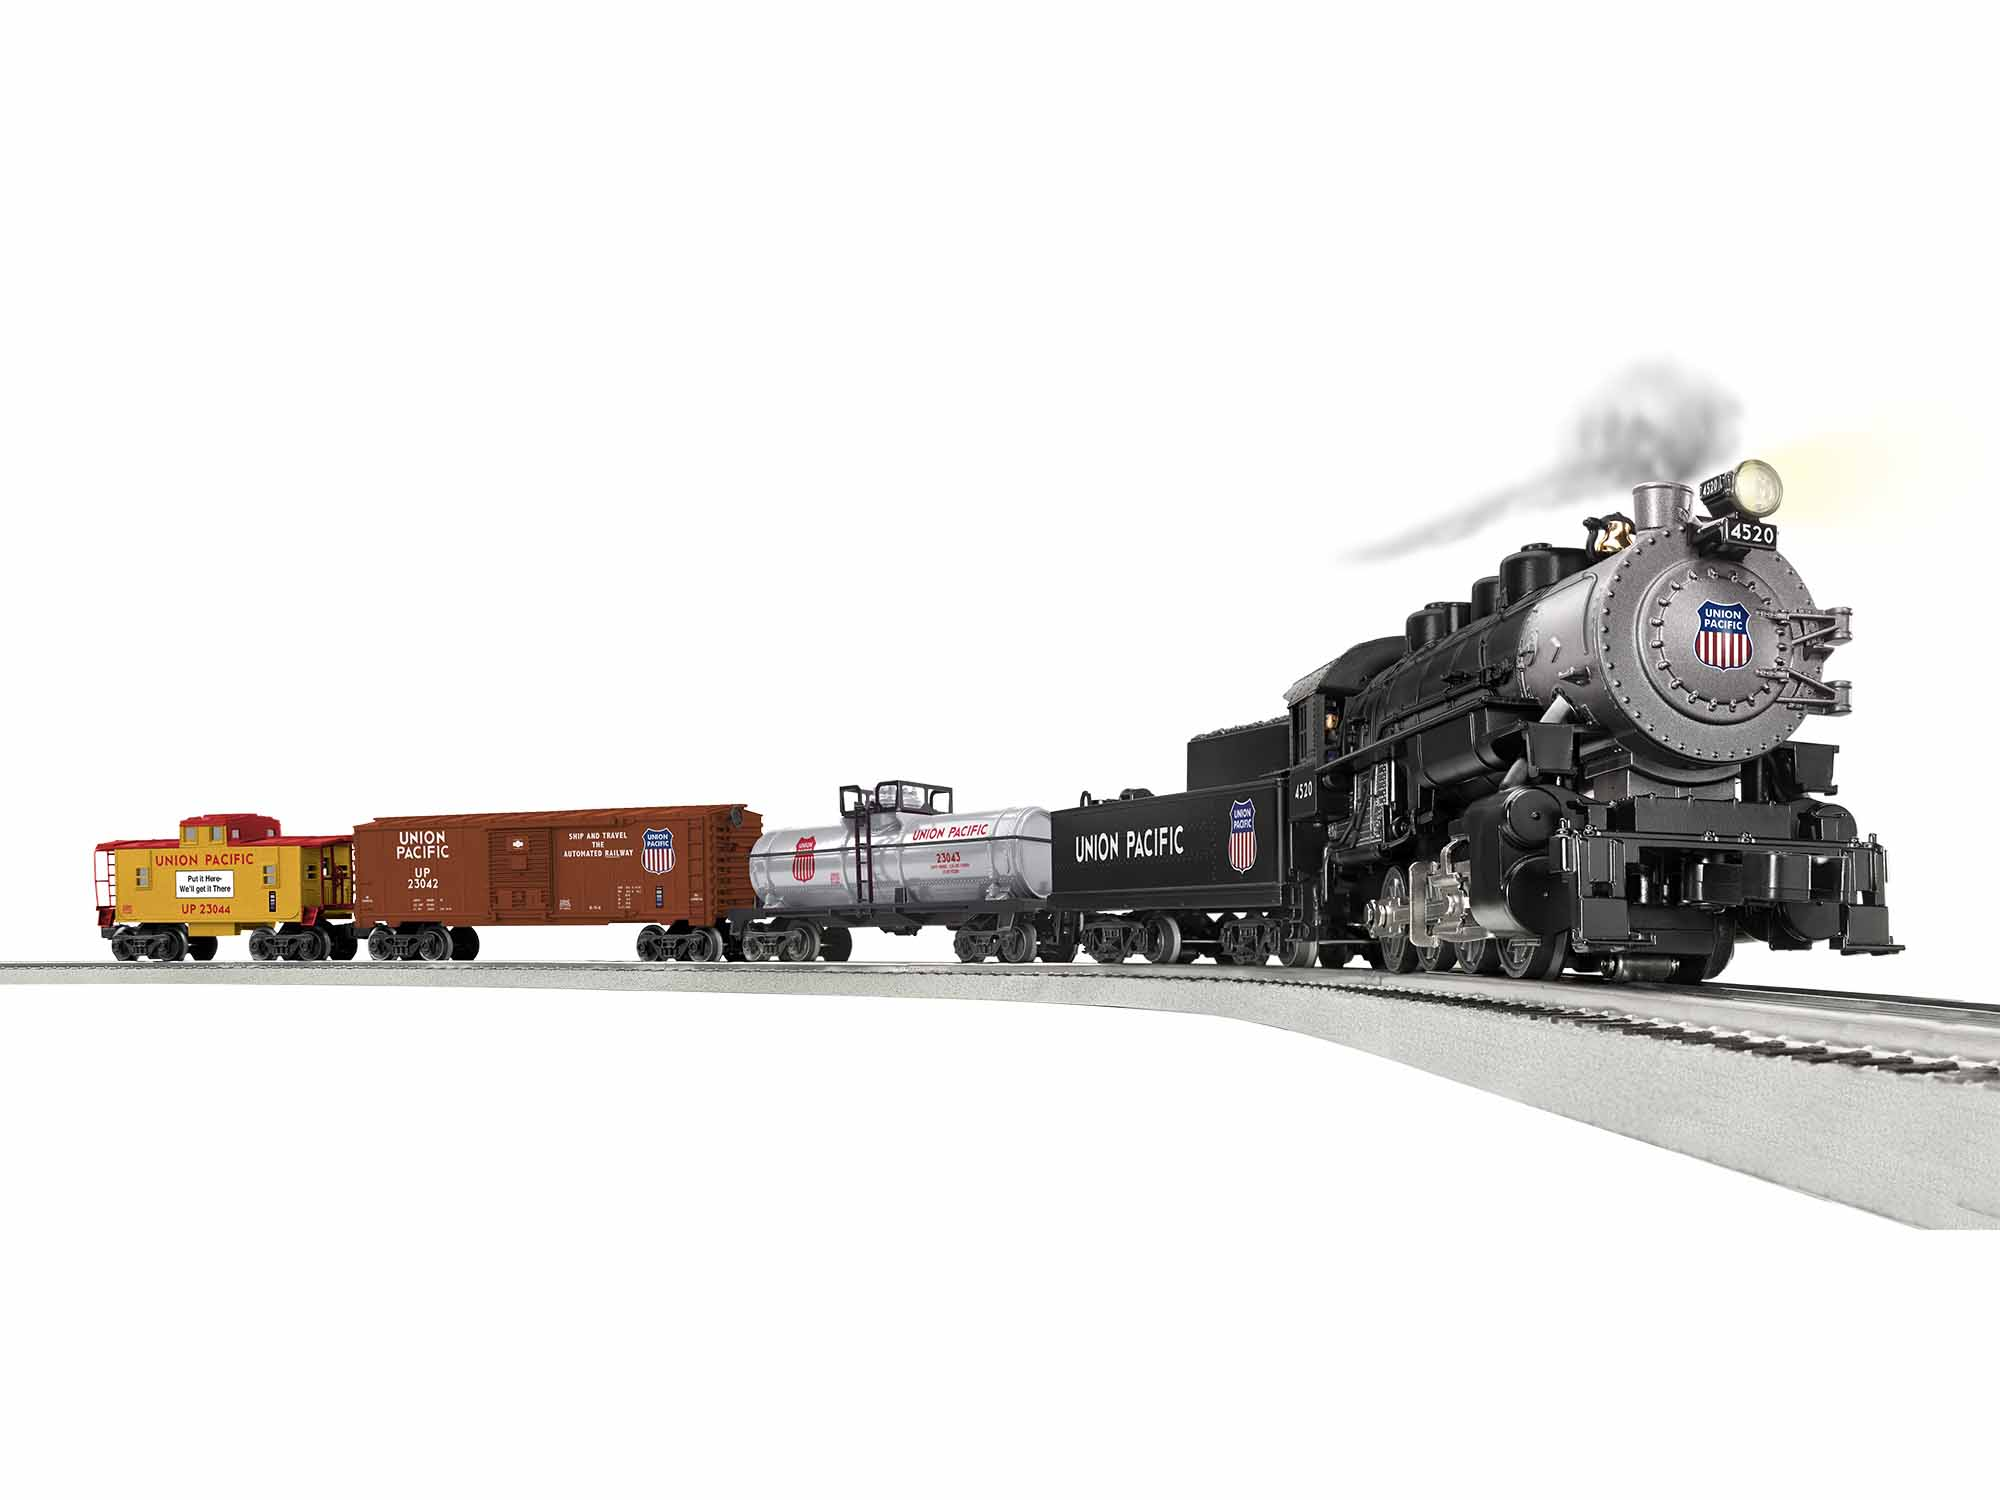 Lionel 1923040 O Union Pacific Flyer Steam Freight Set 3-Rail LionChief Bluetooth Union Pacific 0-8-0, 3 Cars